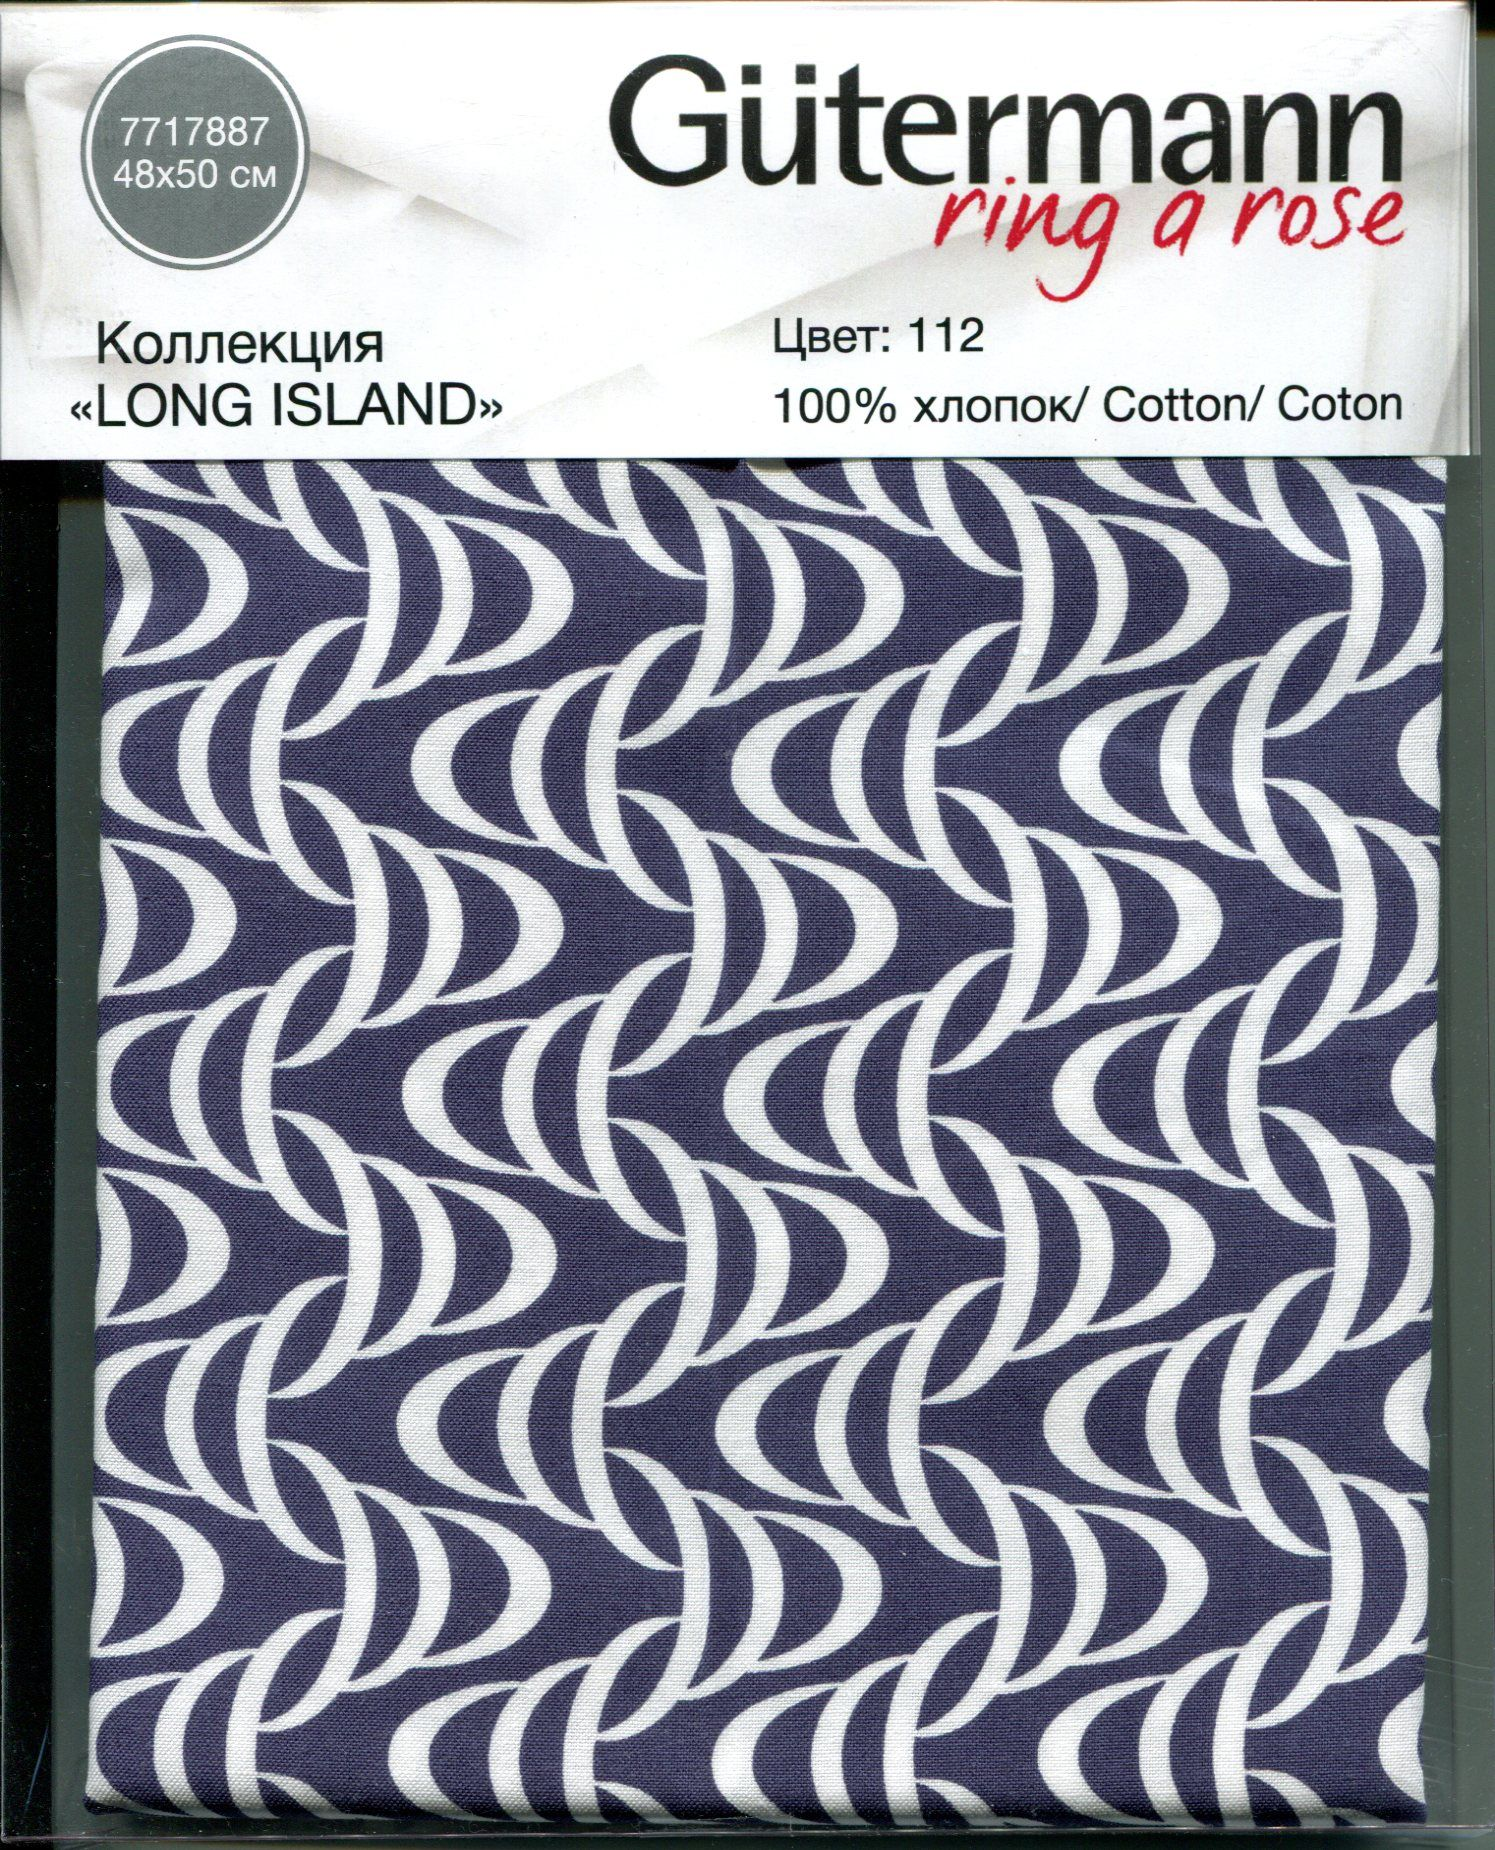 647446 Ткань коллекция 'Long Island', 48х50см, 100% хлопок Гутерманн